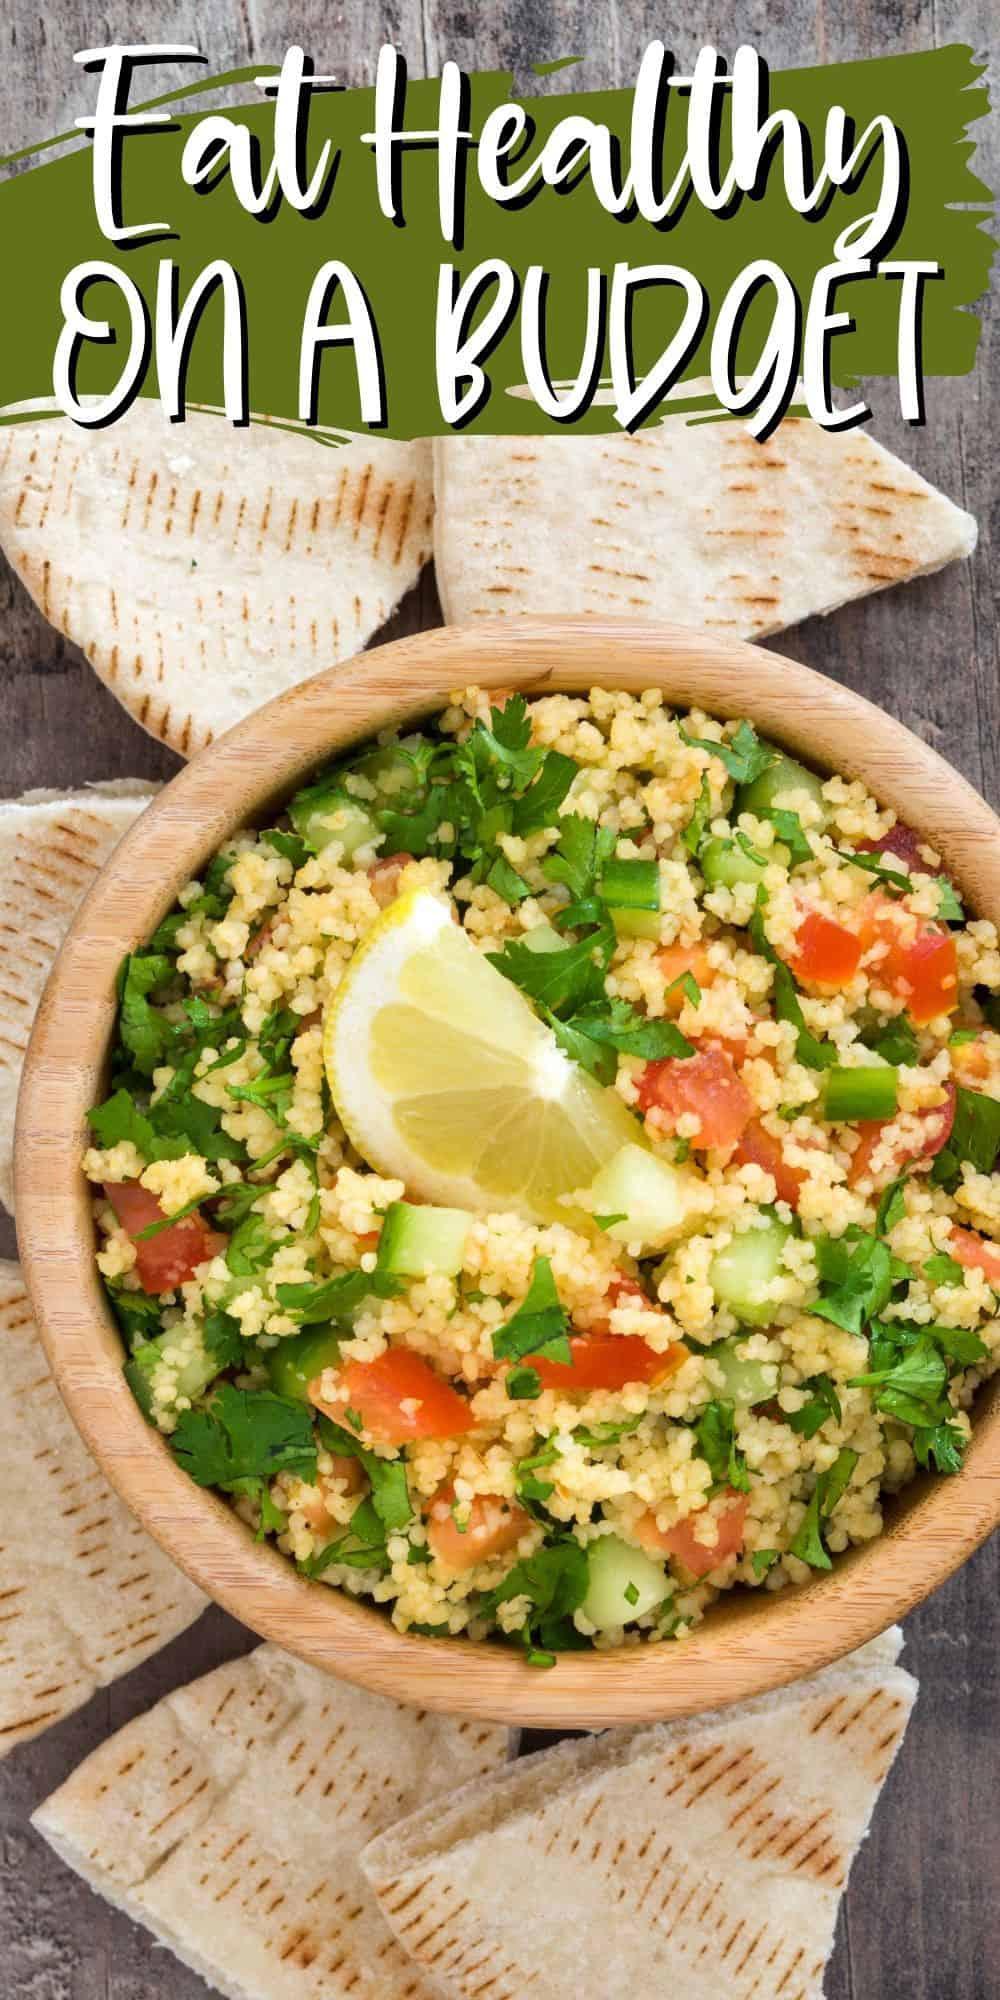 pita with quinoa salad